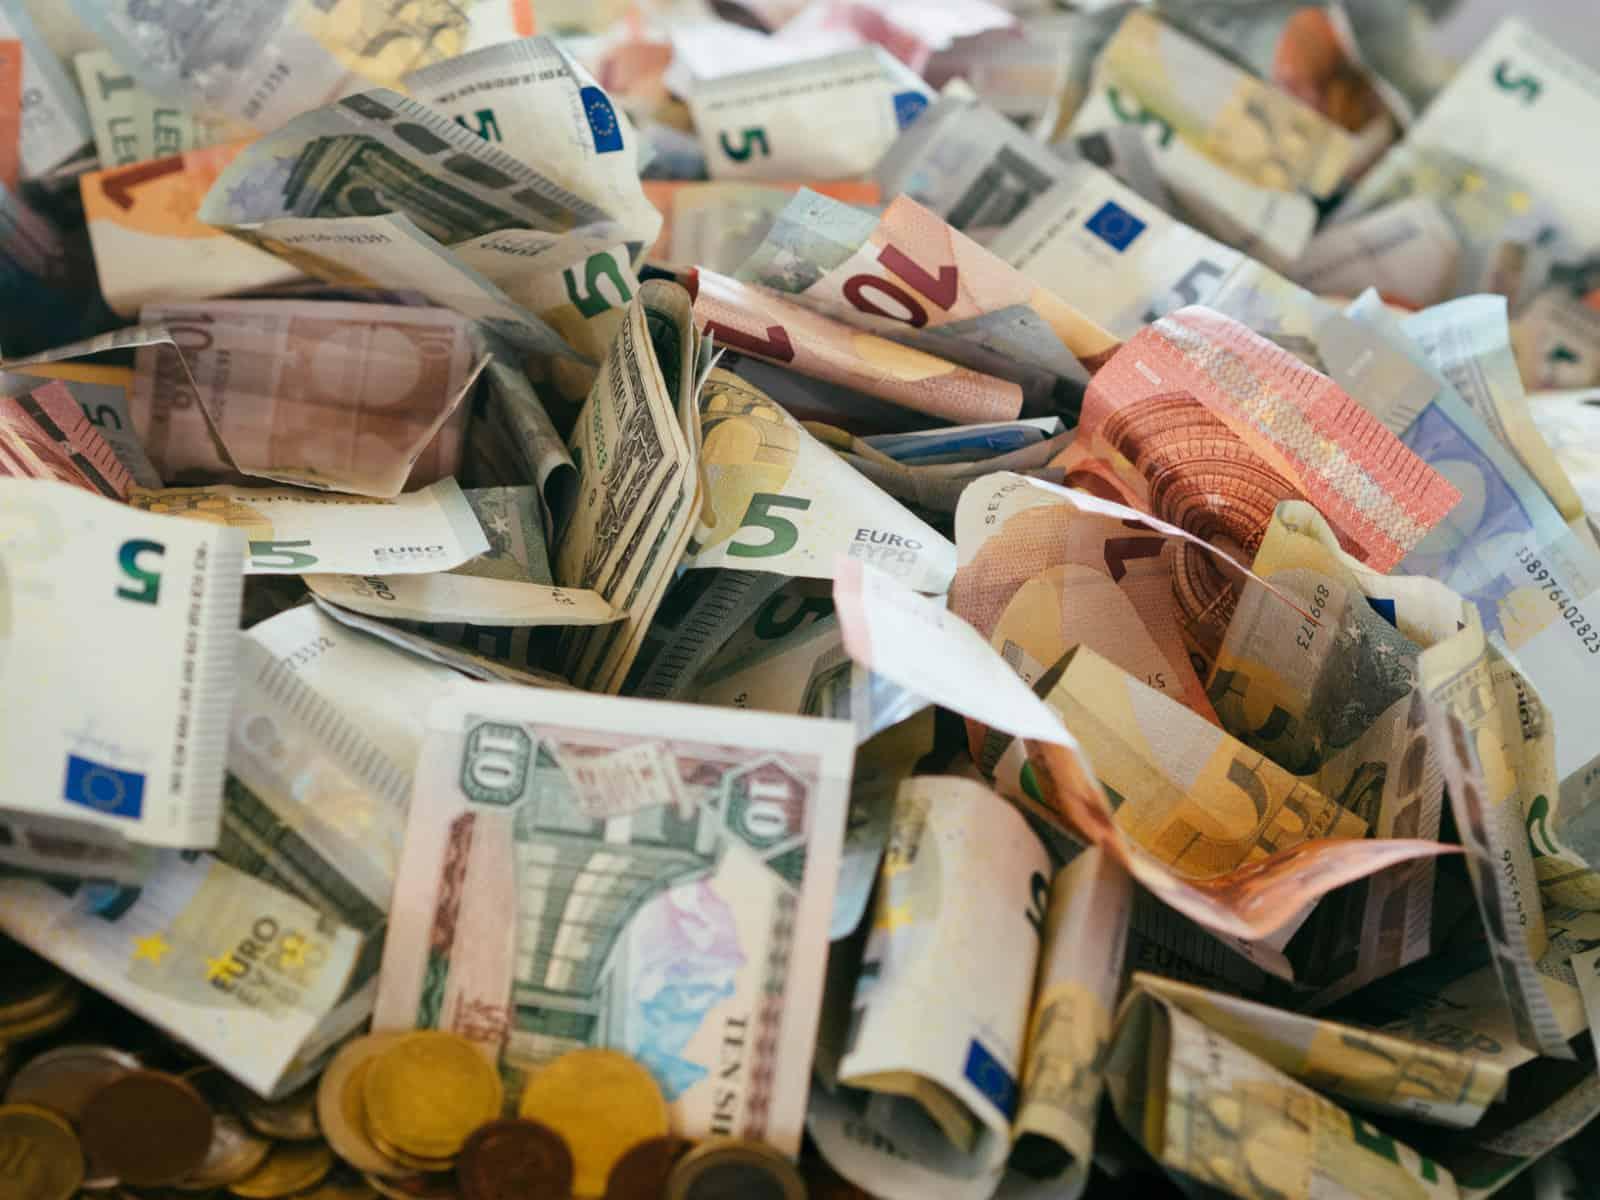 Pile of money representing Fintech R&D